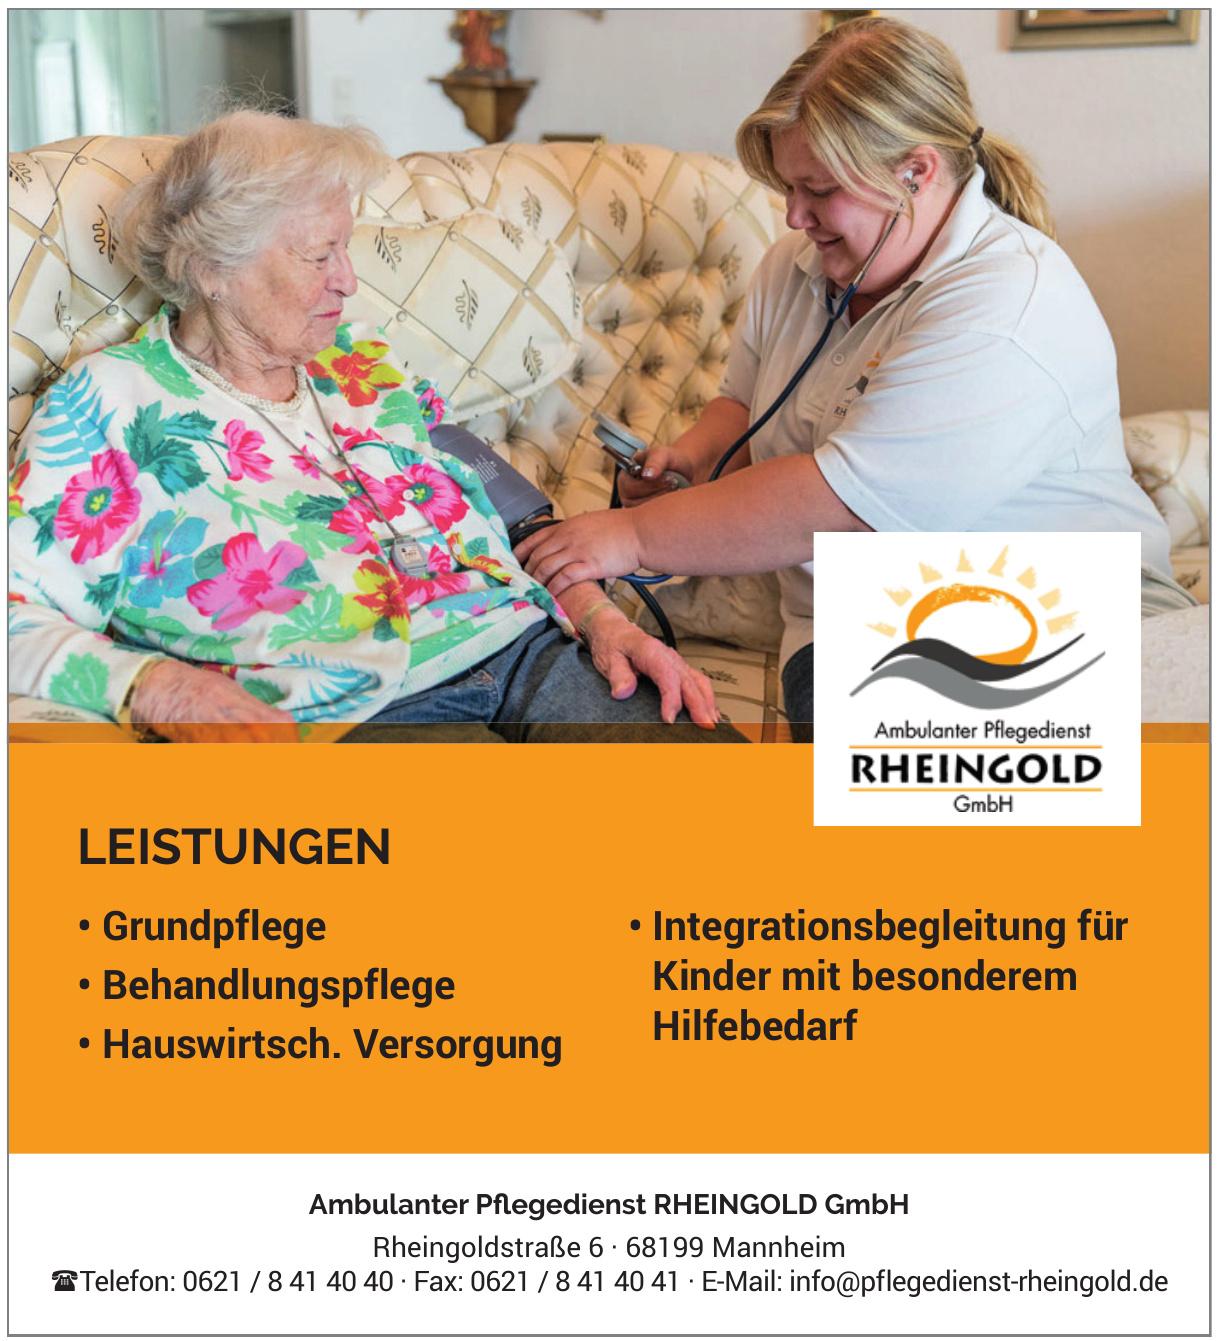 Ambulanter Pflegedienst Rheingold GmbH